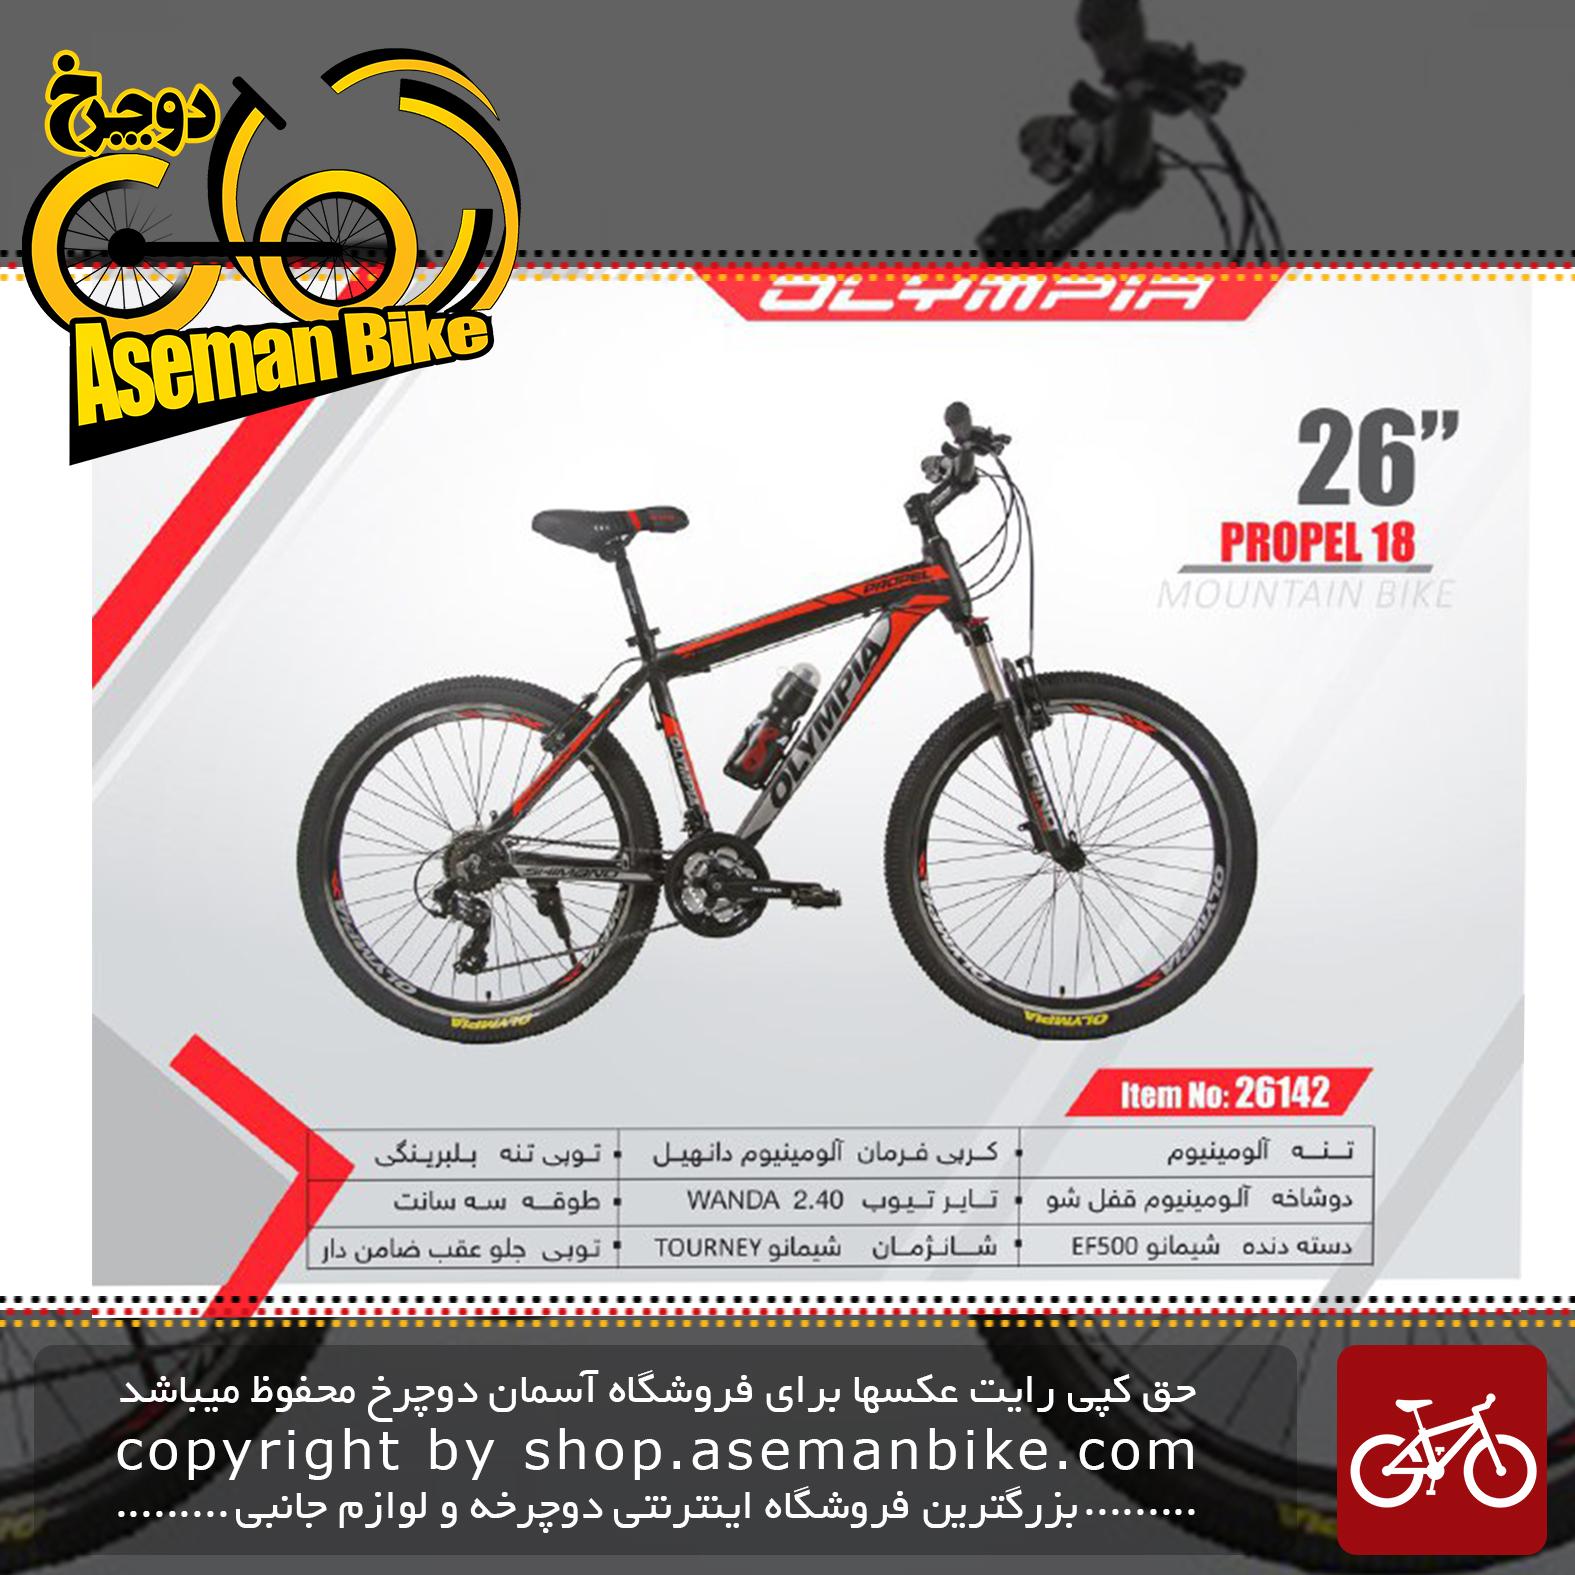 دوچرخه کوهستان المپیا سایز 26مدل پروپل18 OLYMPIA SIZE 26 PROPEL 18